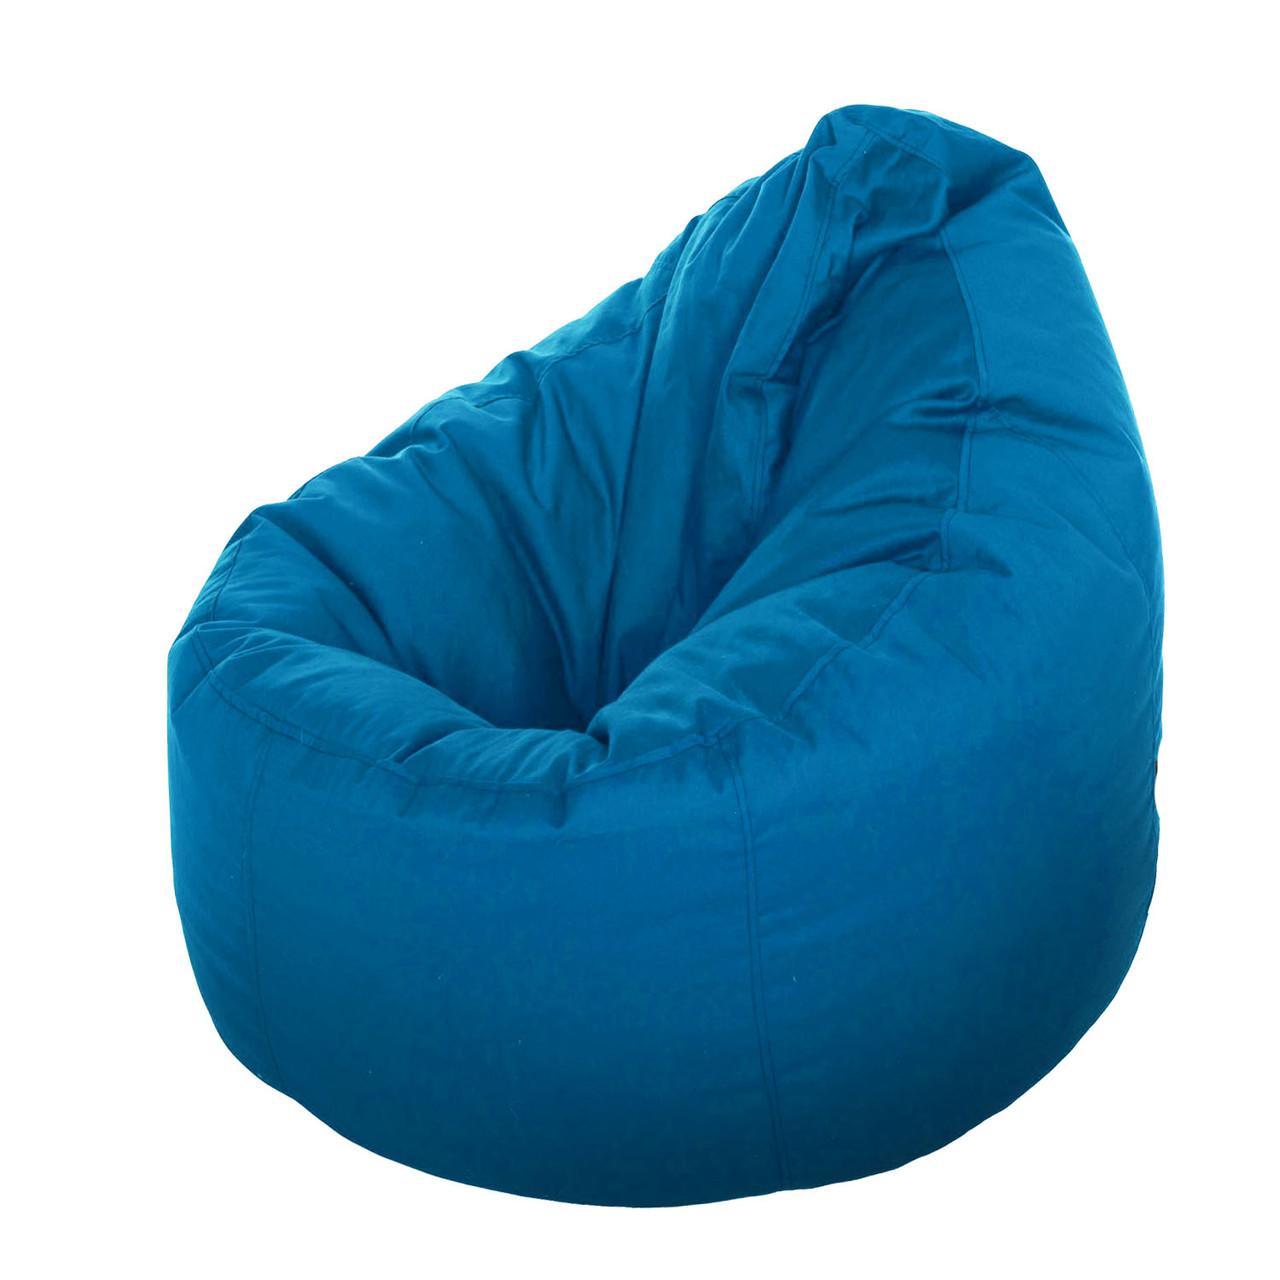 Кресло пуф груша XXL цвет электрик (синий)